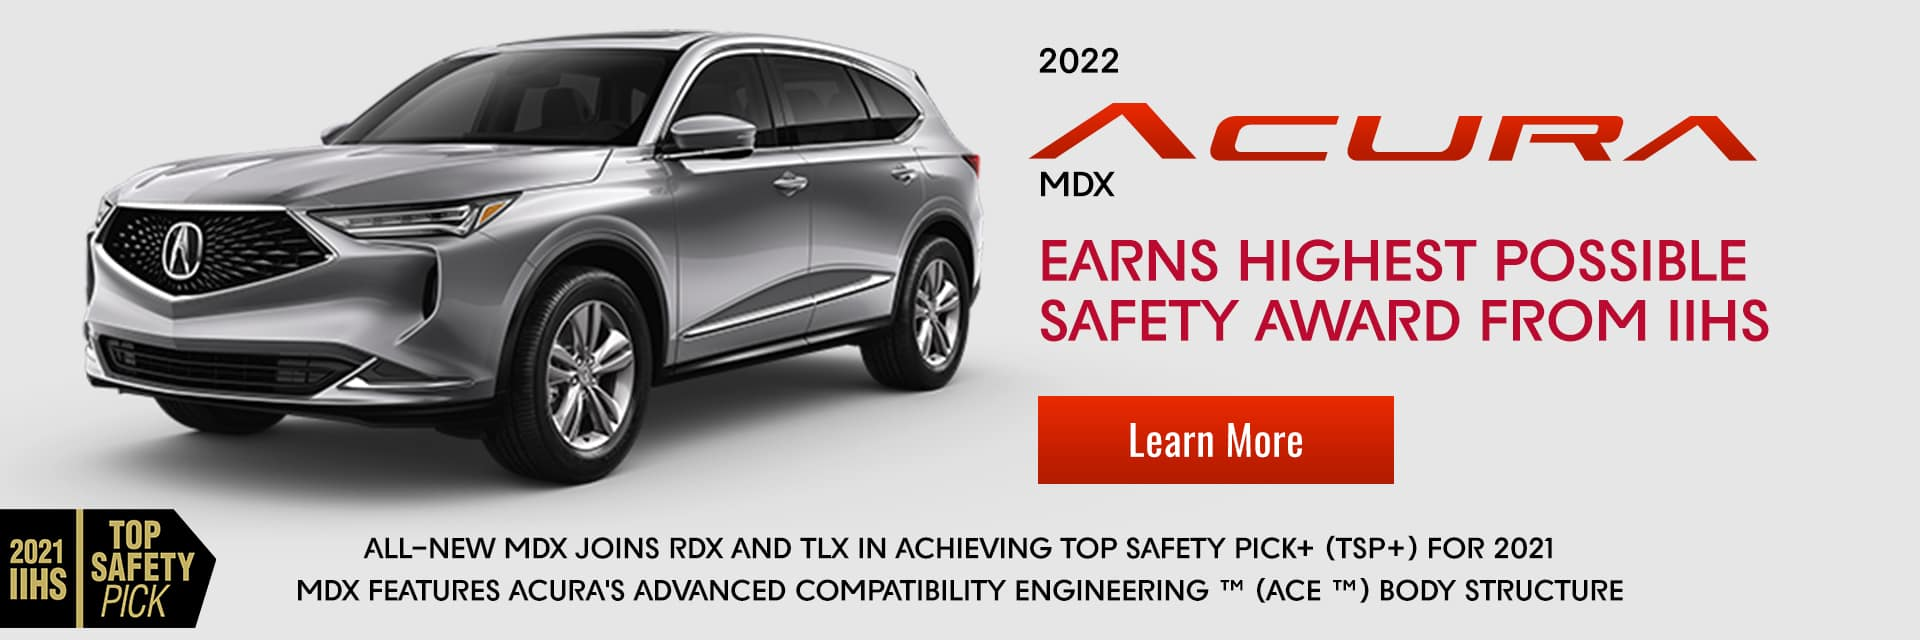 2022 Acura MDX Safety Award